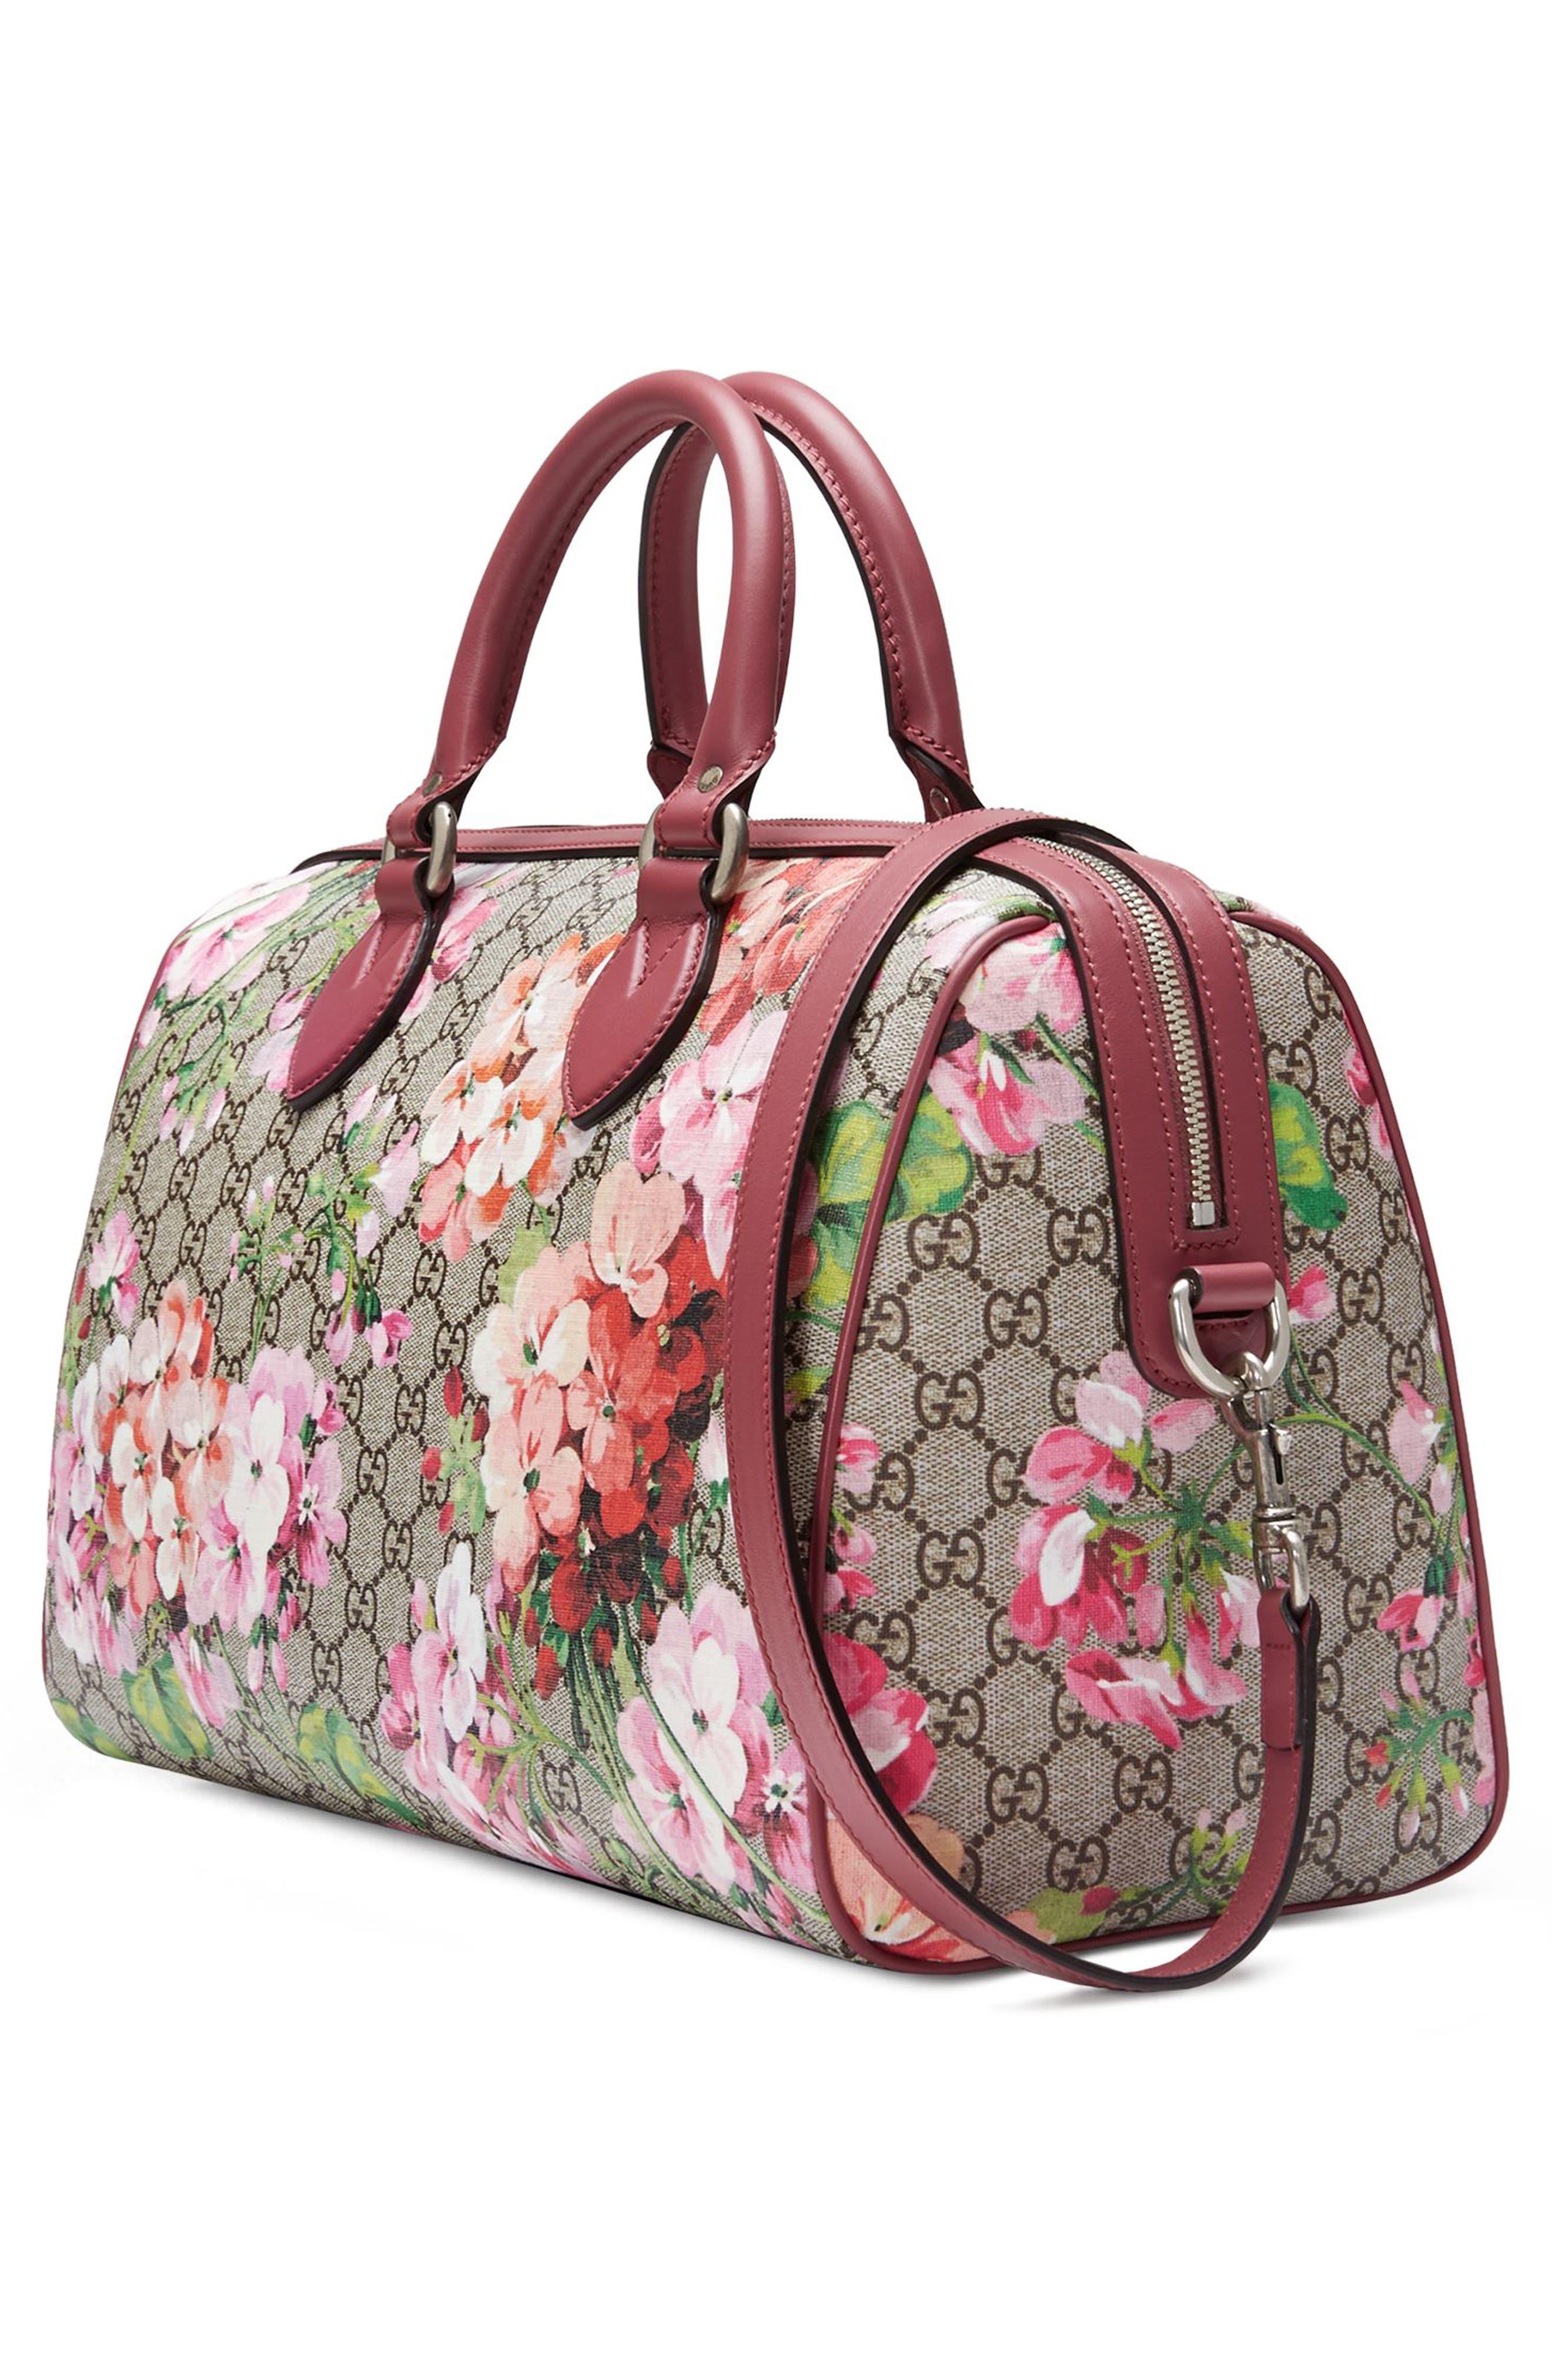 Medium Blooms GG Supreme Top Handle Canvas Bag,                             Alternate thumbnail 4, color,                             250